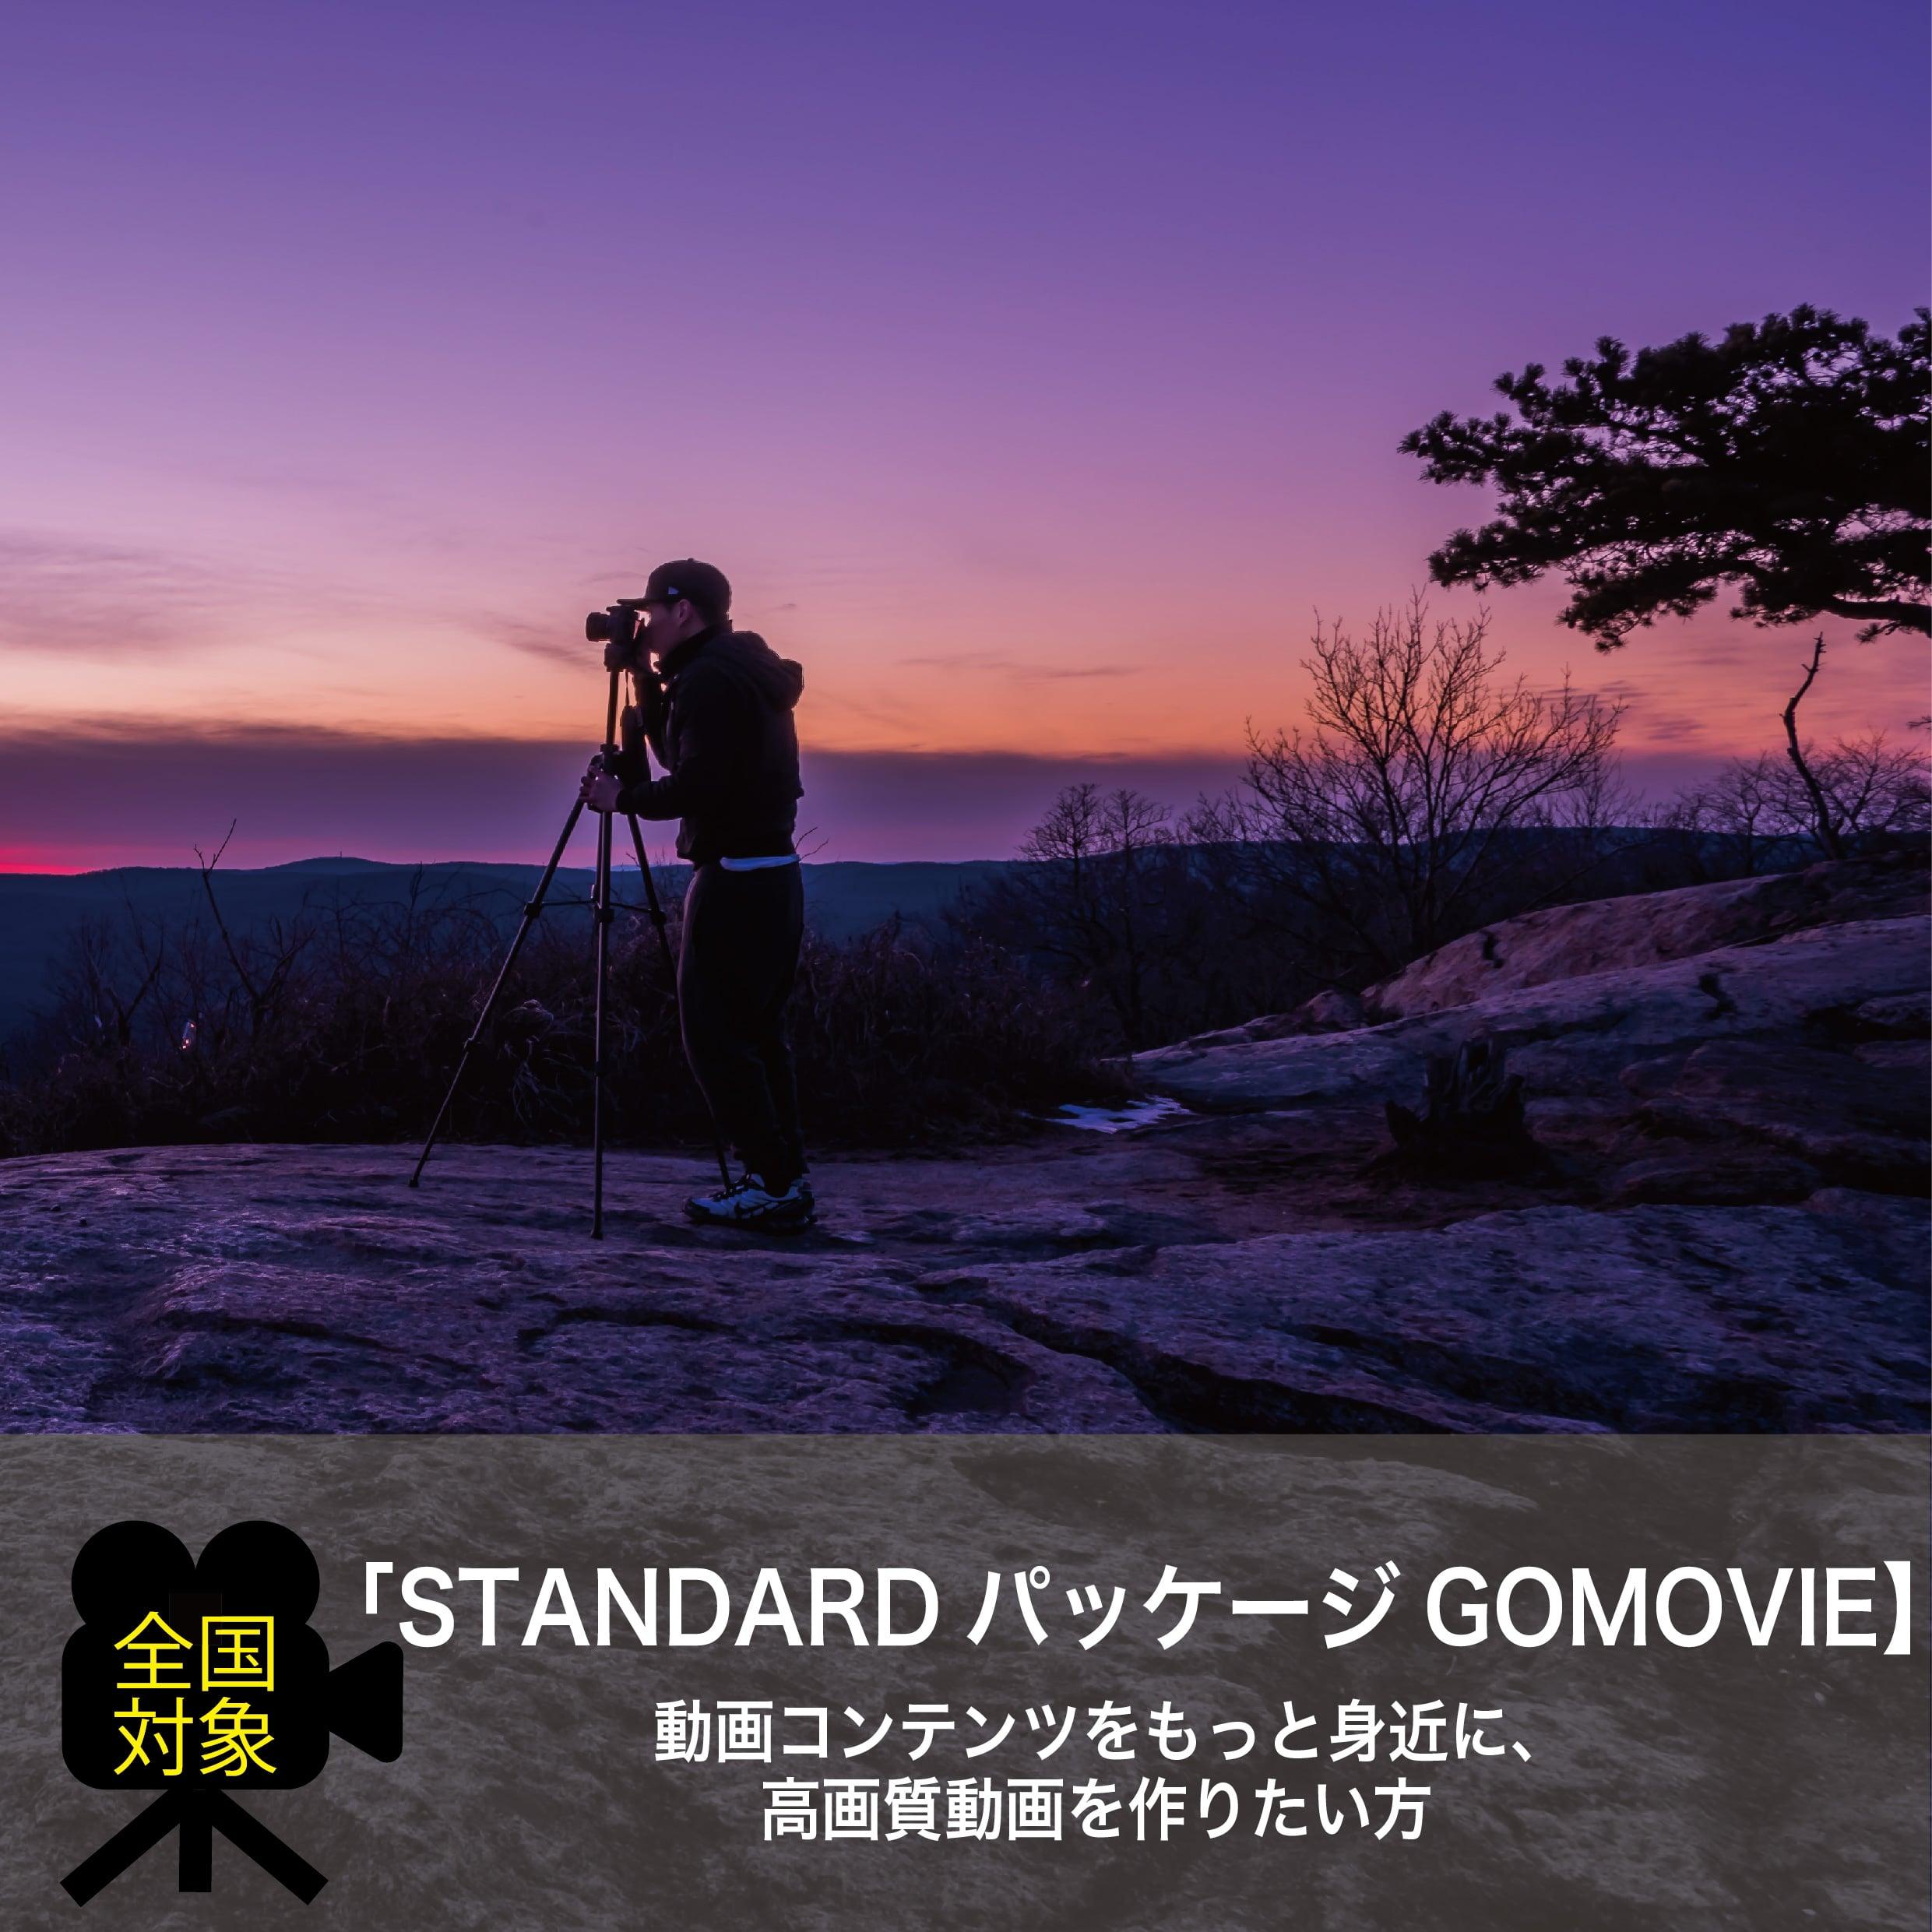 【STANDARDパッケージGOMOVIE】動画コンテンツをもっと身近に、高画質動画を作りたい方のイメージその1